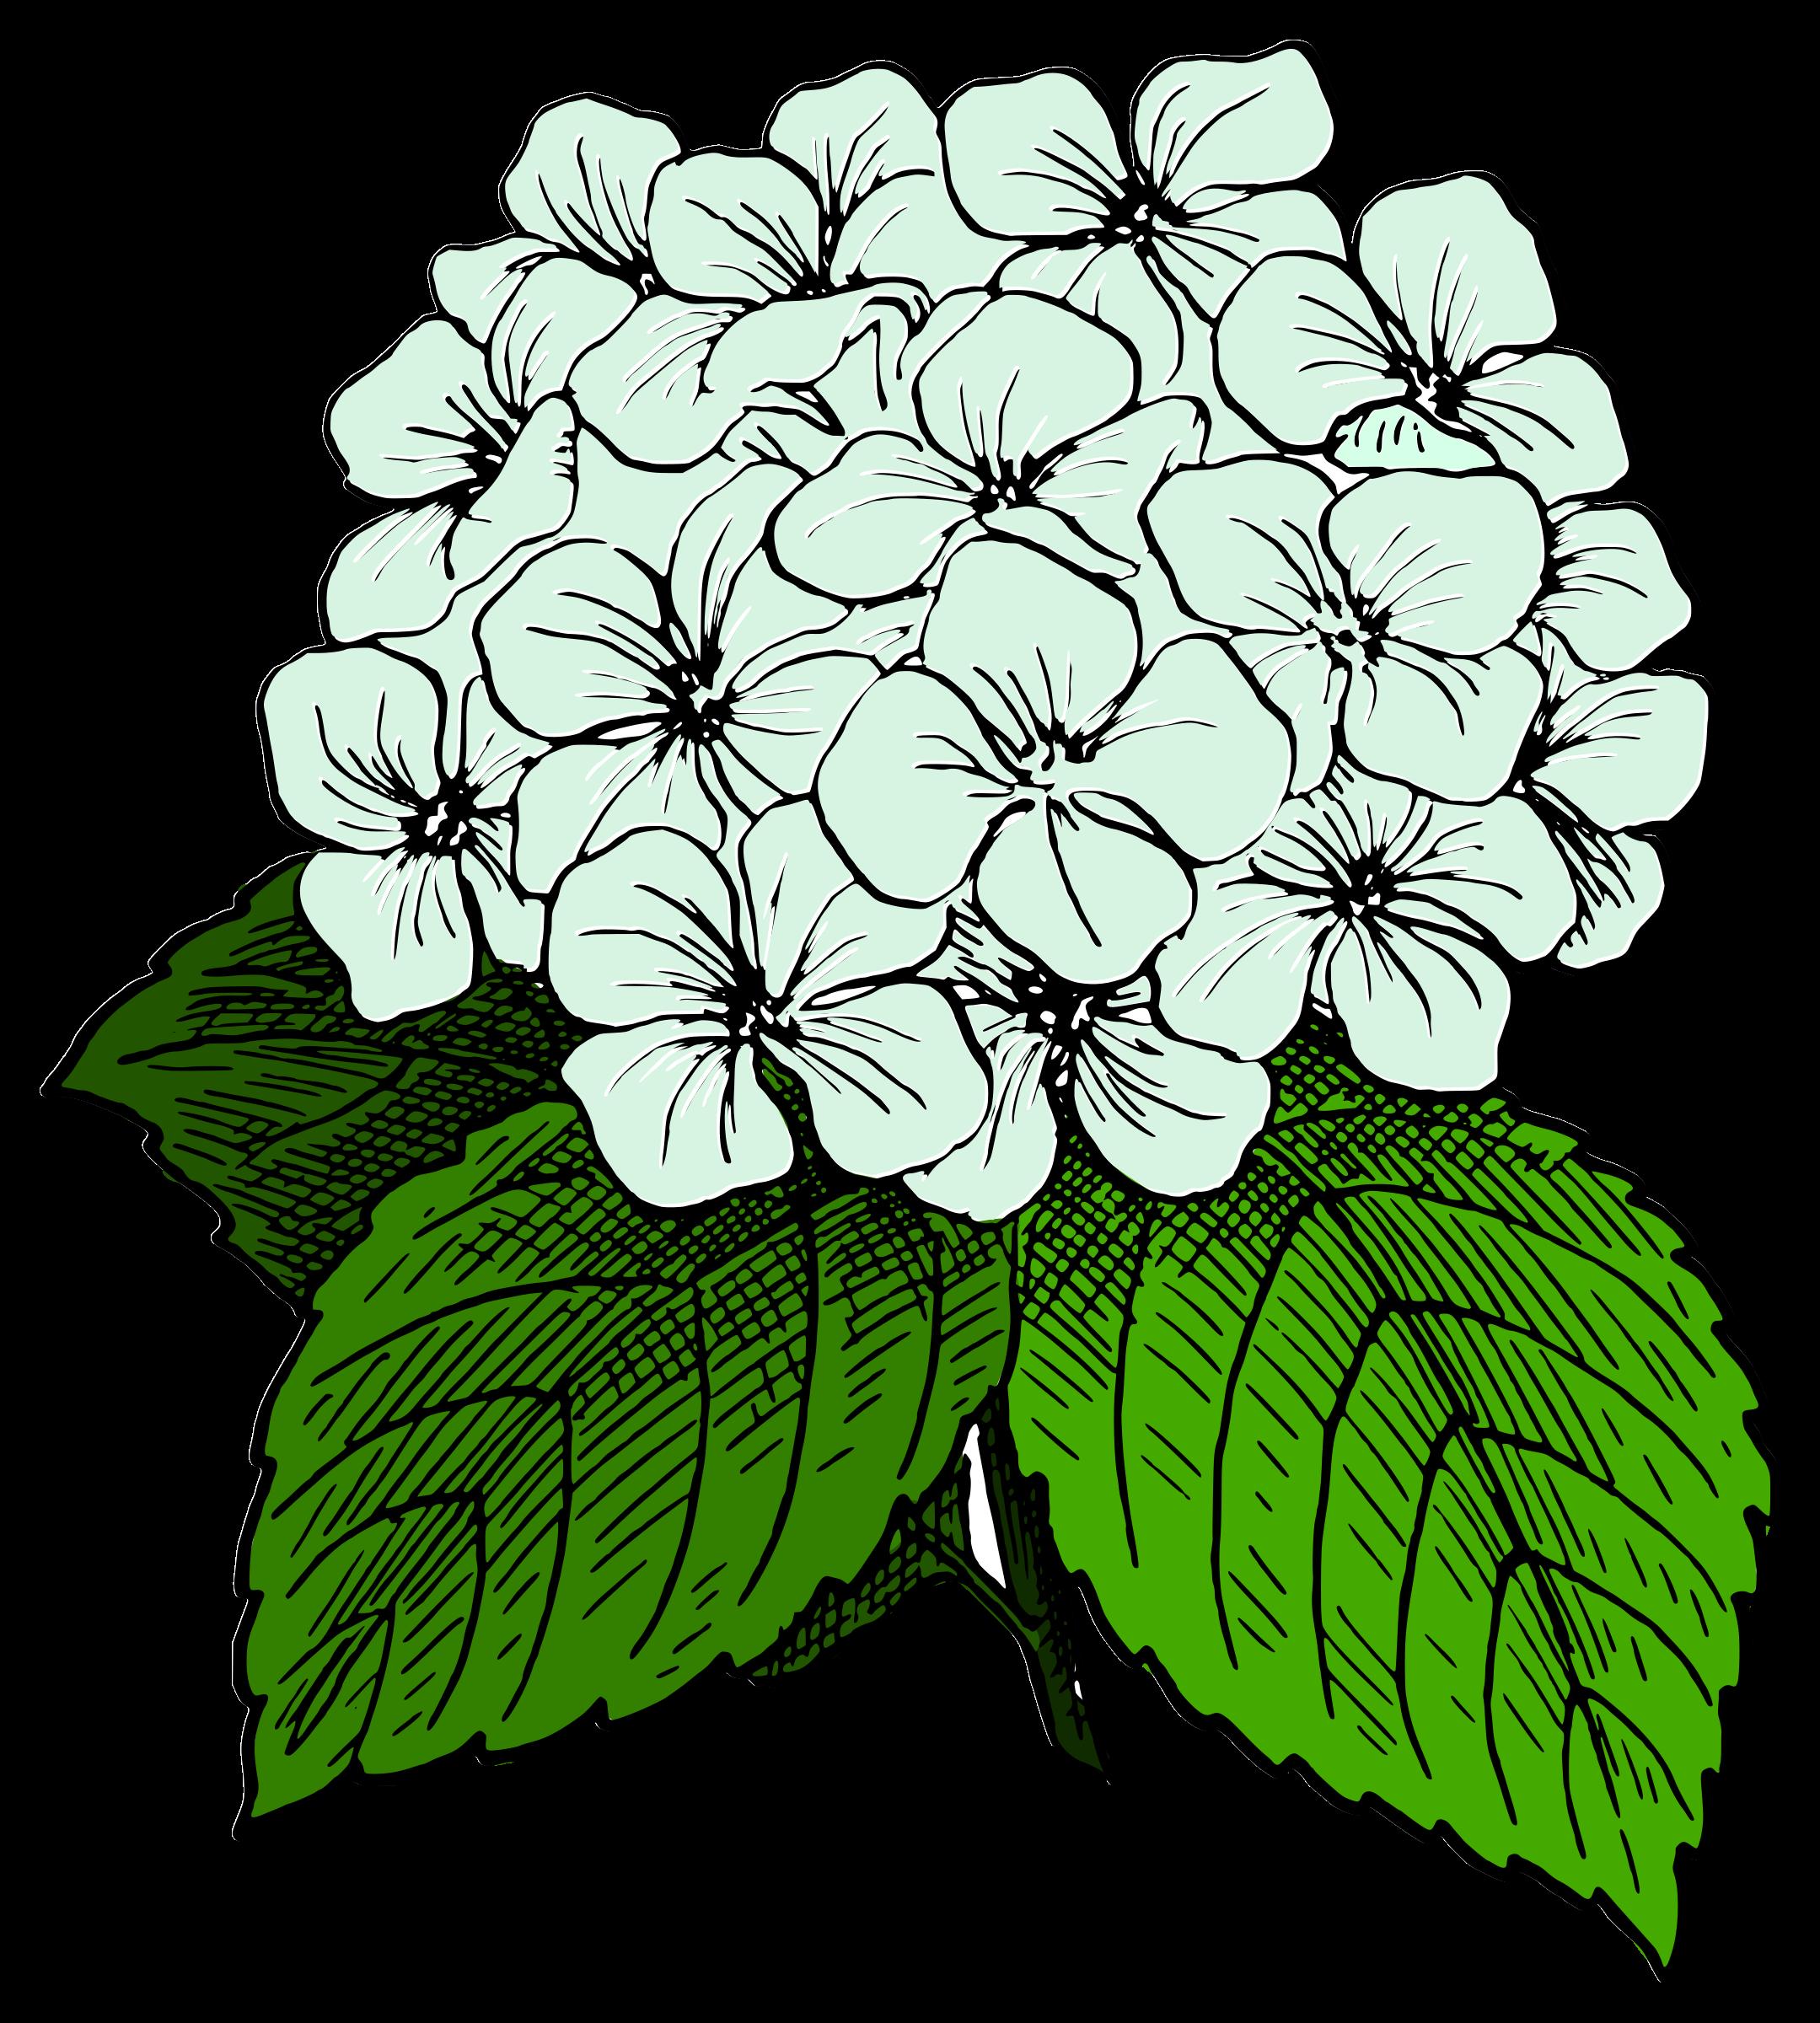 image result for black and white clip art hydrangea paper art rh pinterest com hydrangea clipart black and white clipart hydrangea images